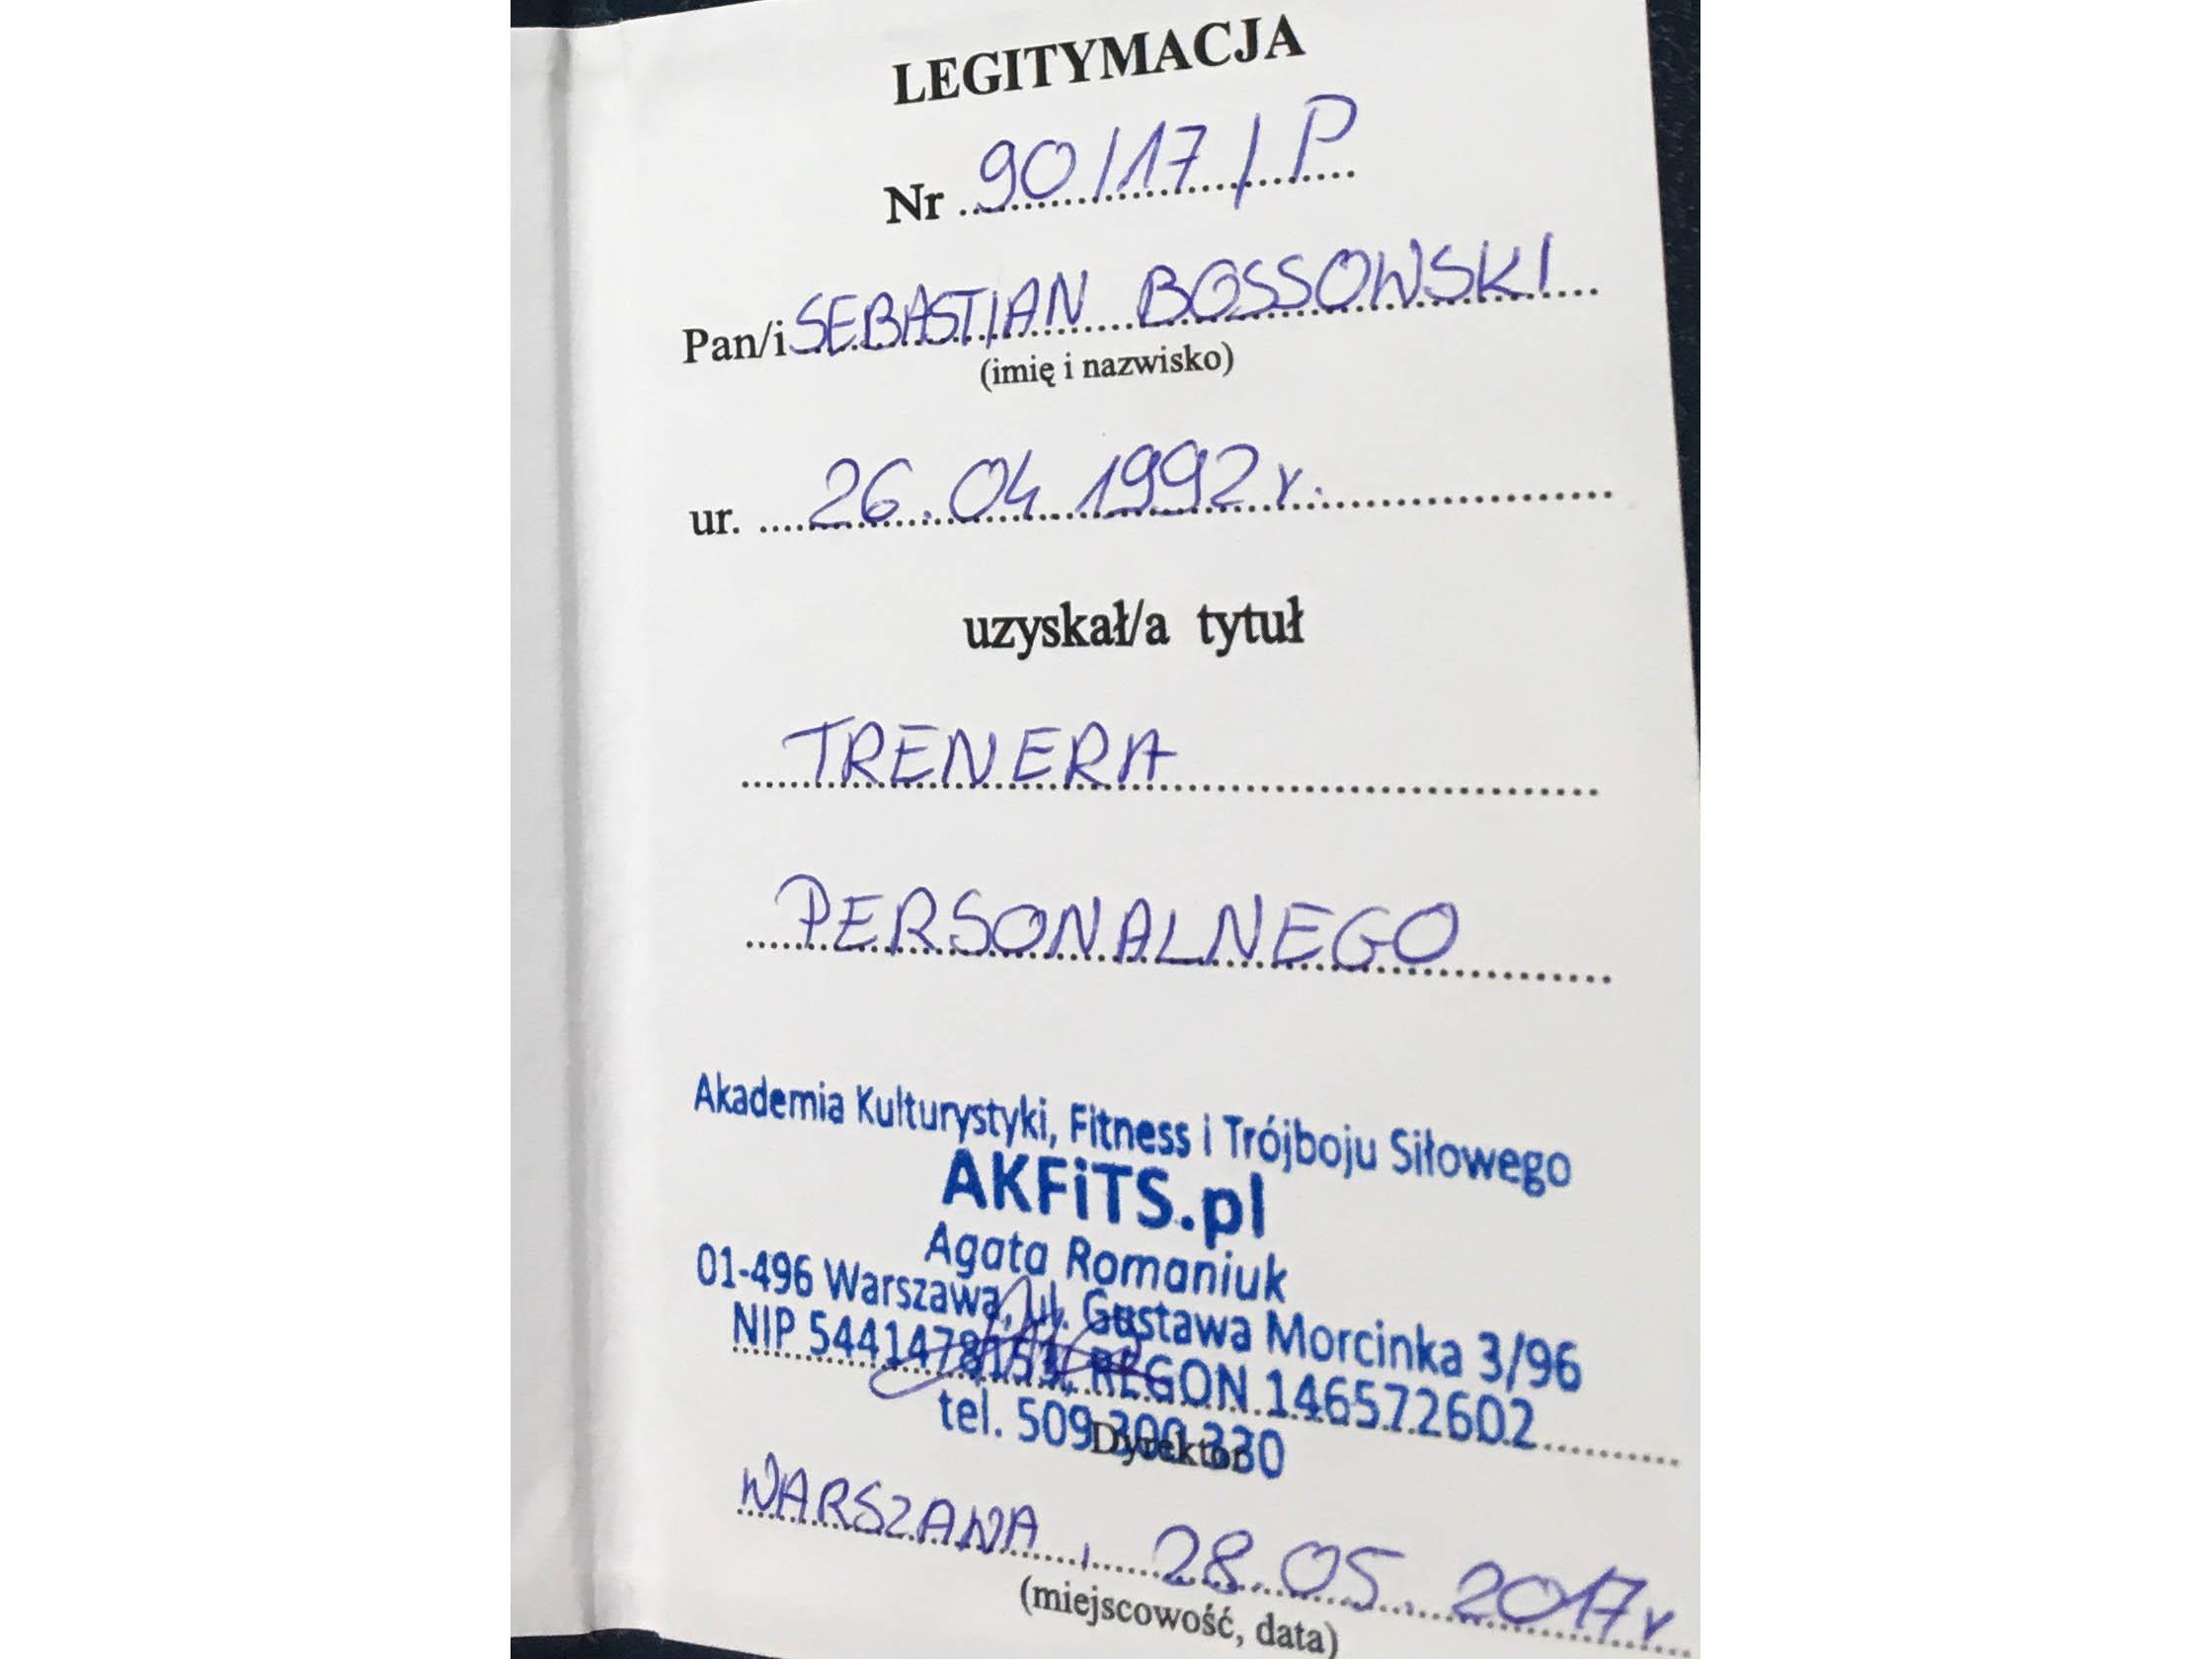 Sebastian Bossowski certyfikat 1.jpg